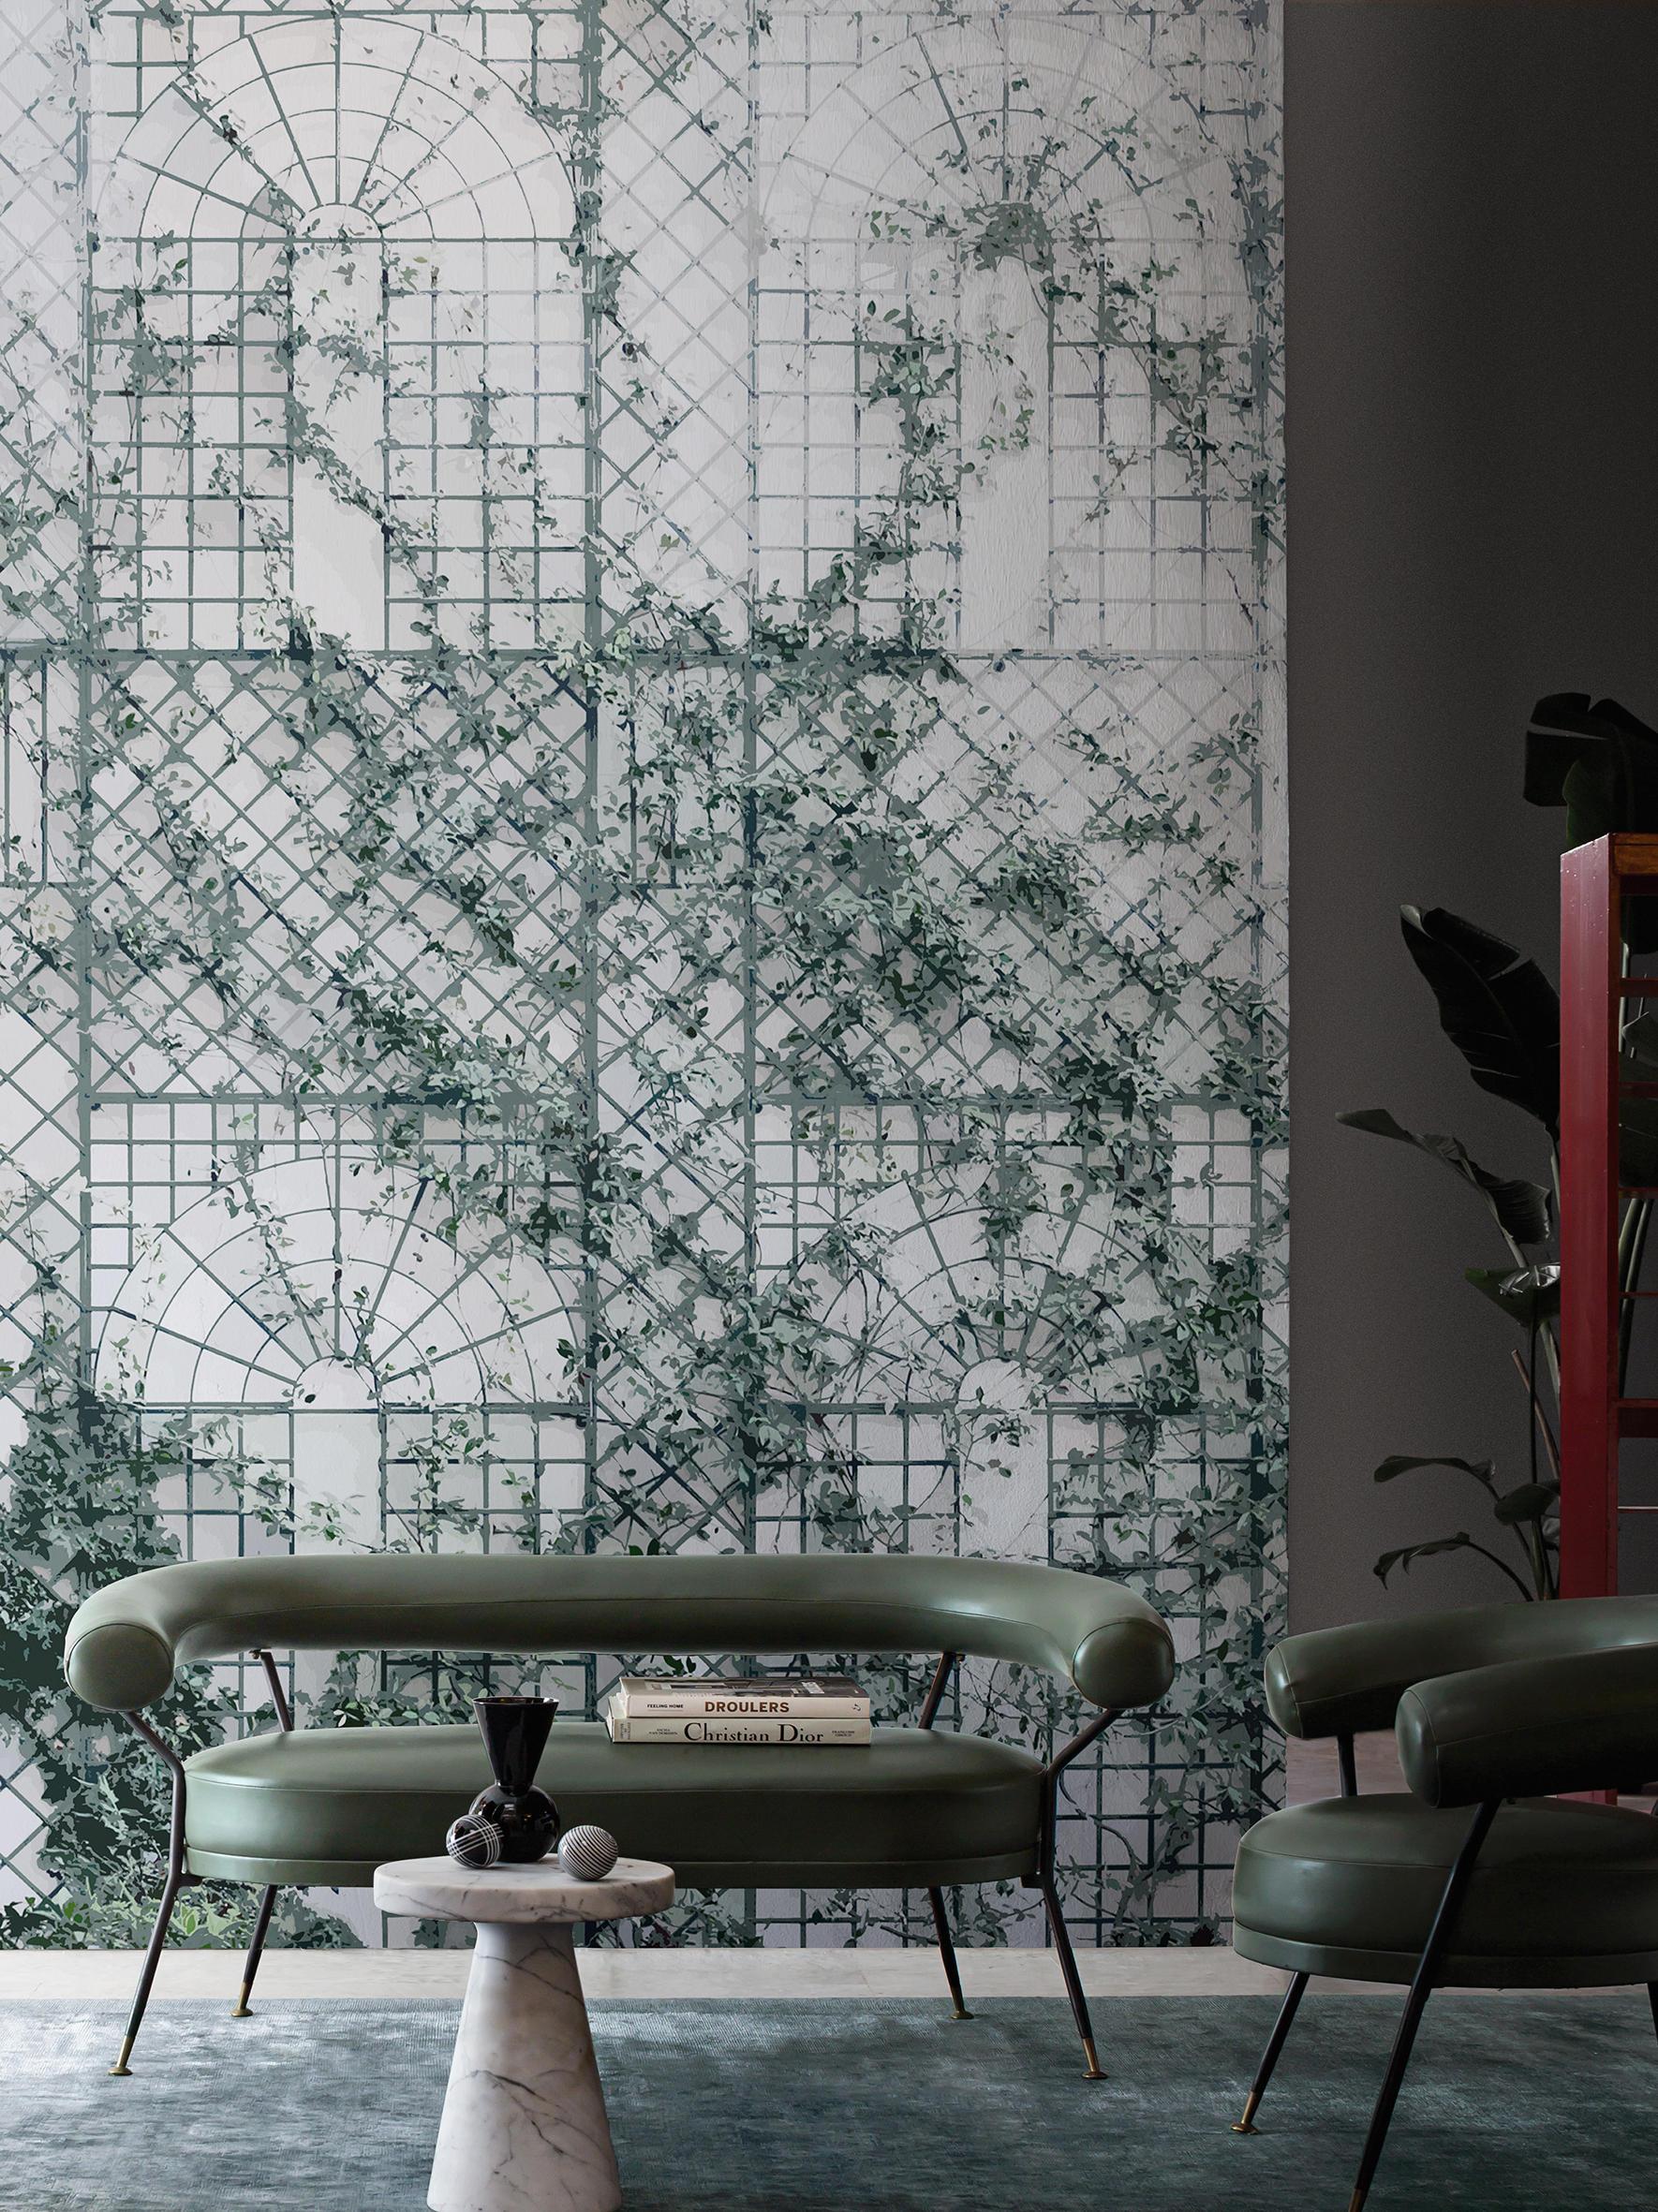 Treillage wandbel ge tapeten von wall dec architonic for Stoffa da parati